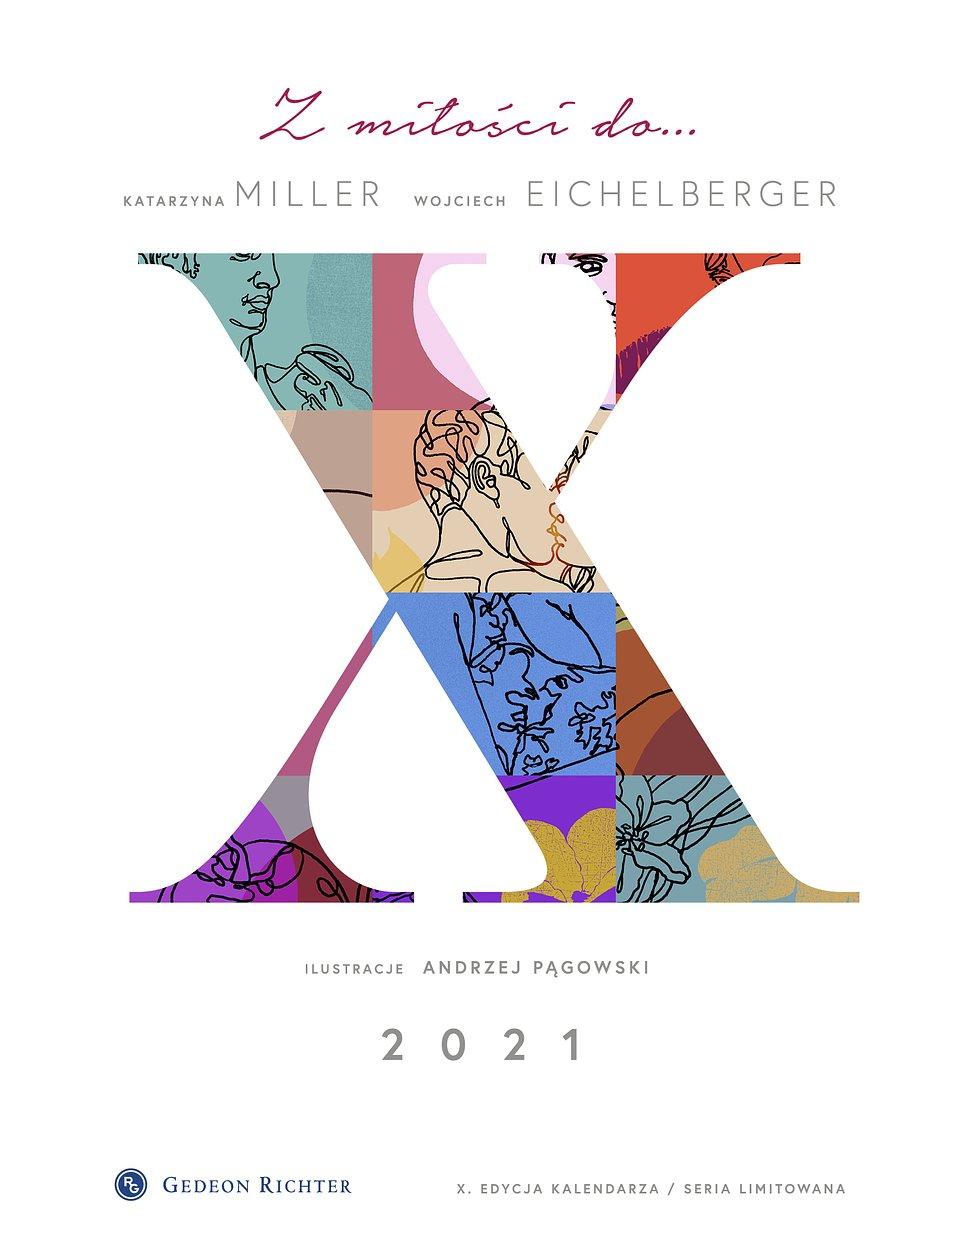 Kalendarz Artystyczny Gedeon Richter -